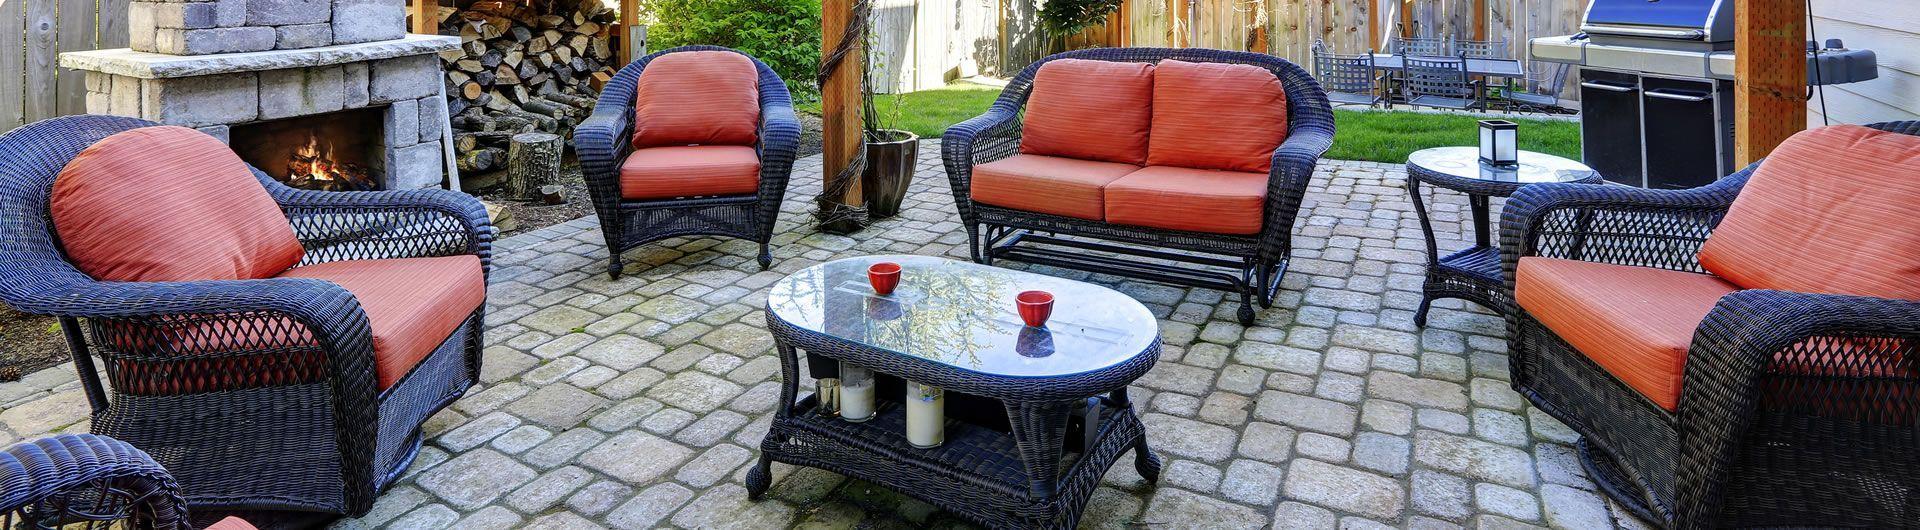 wicker patio setting